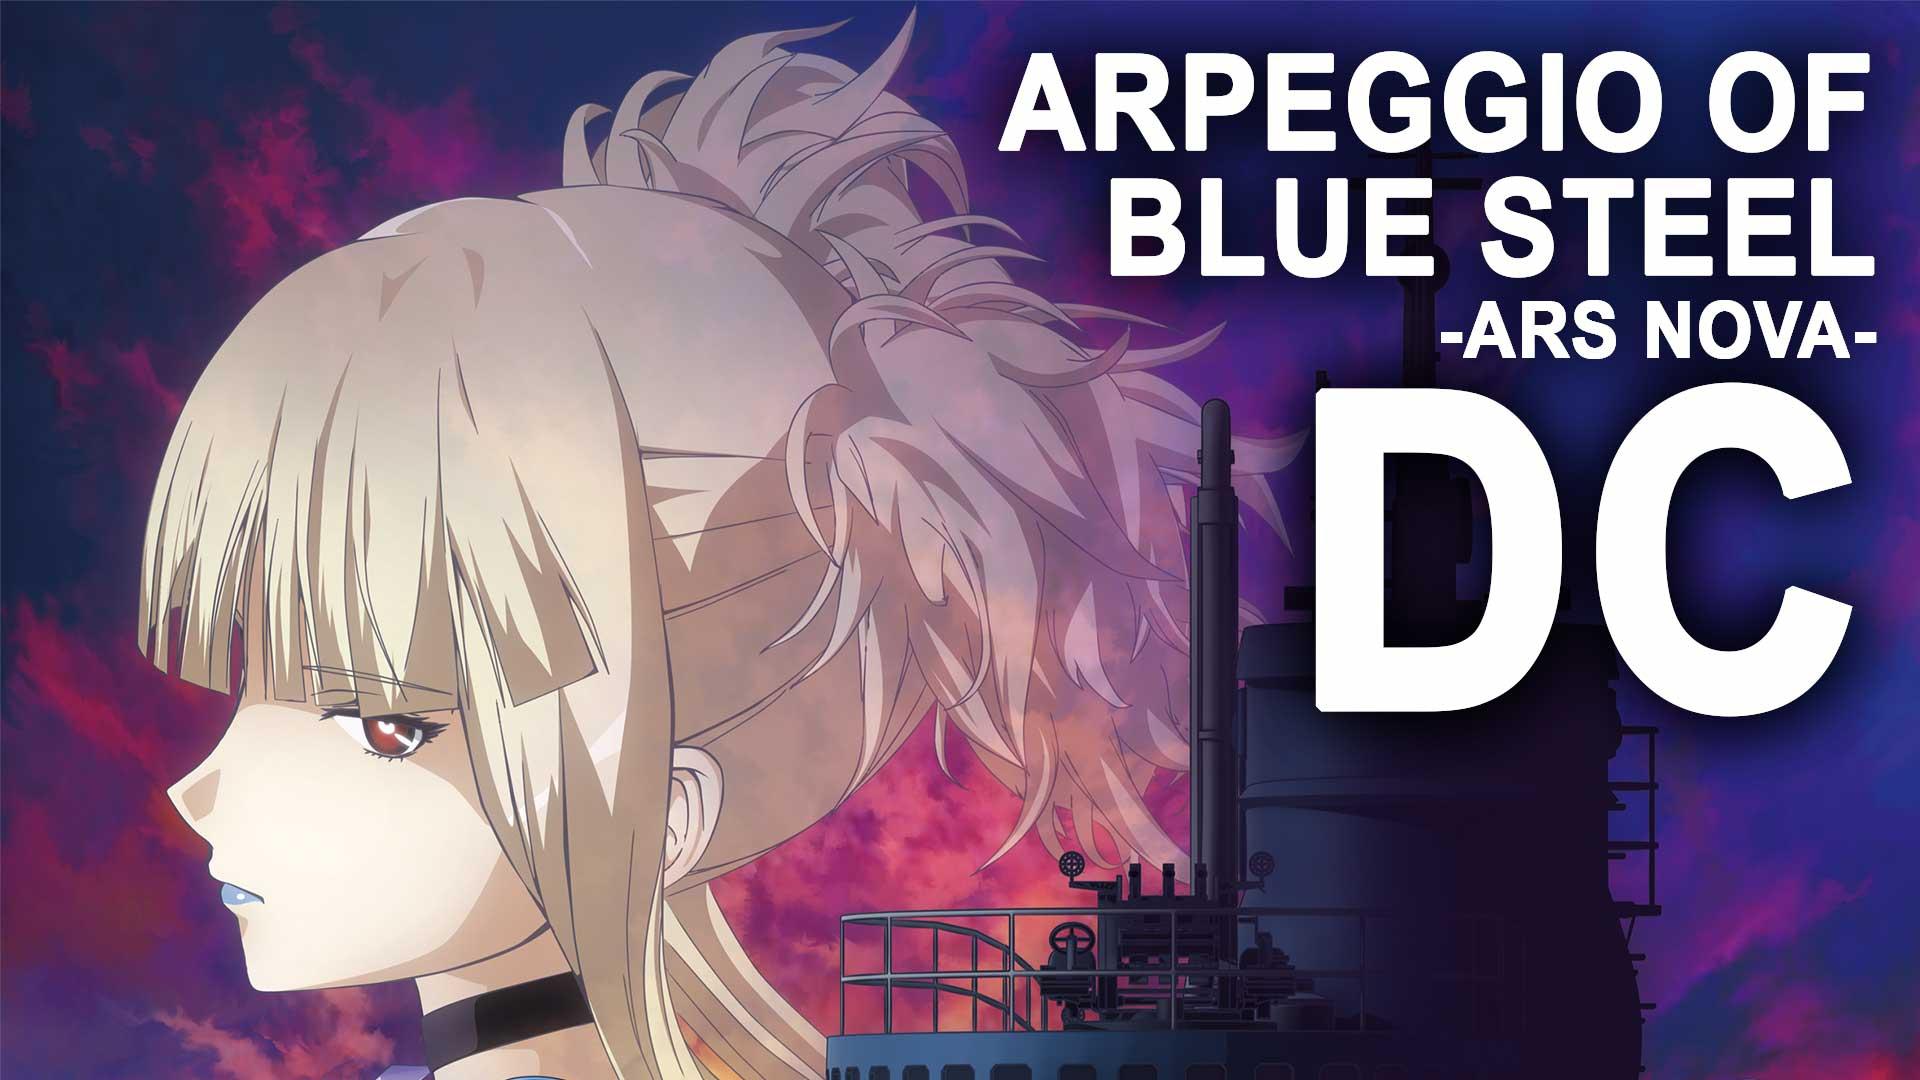 Arpeggio of Blue Steel - Ars Nova - DC